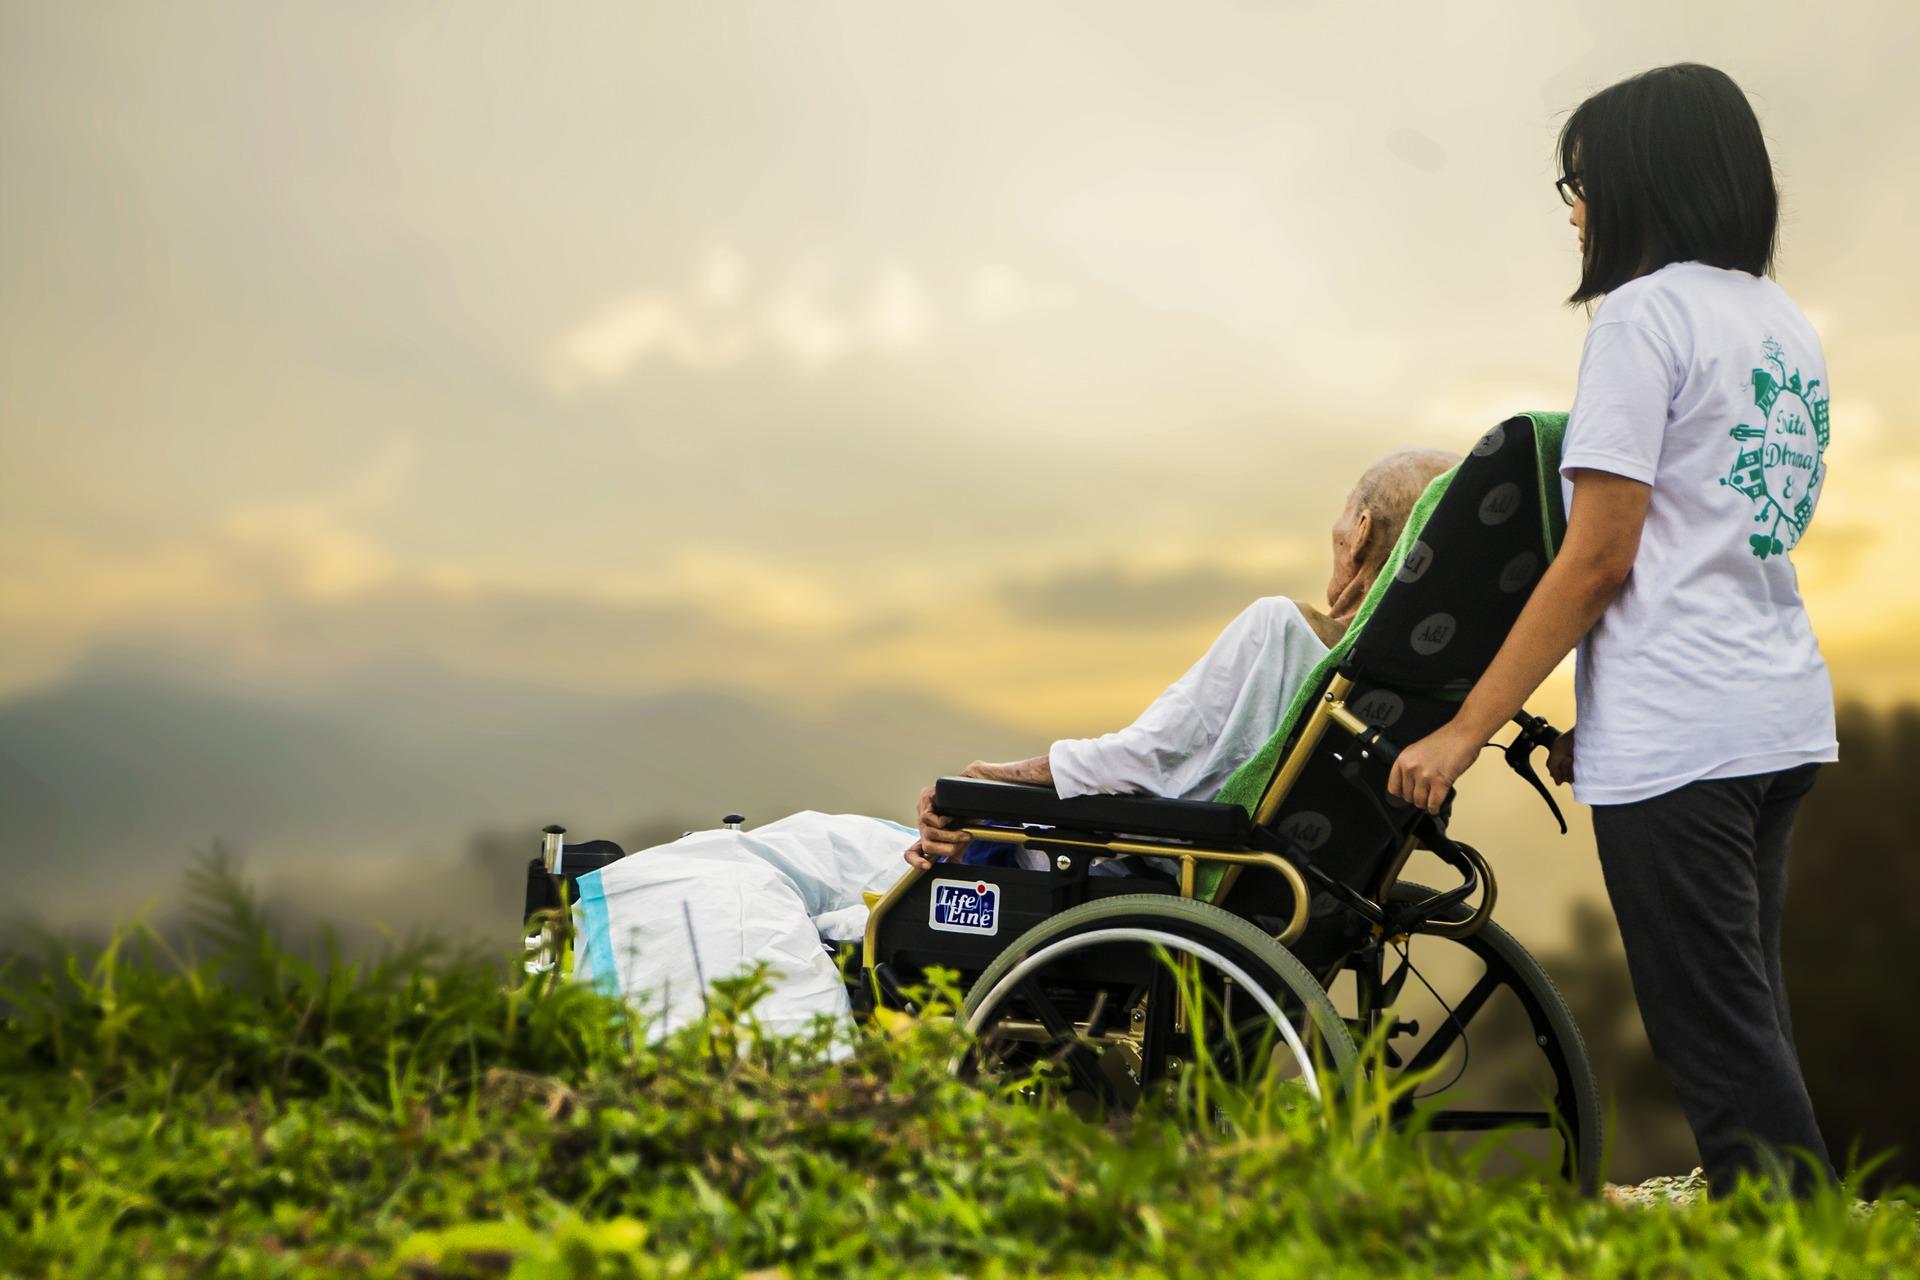 upload/IB-Mitte_NEU2017/FD_SachsenOst/hospice-1821429_1920.jpg